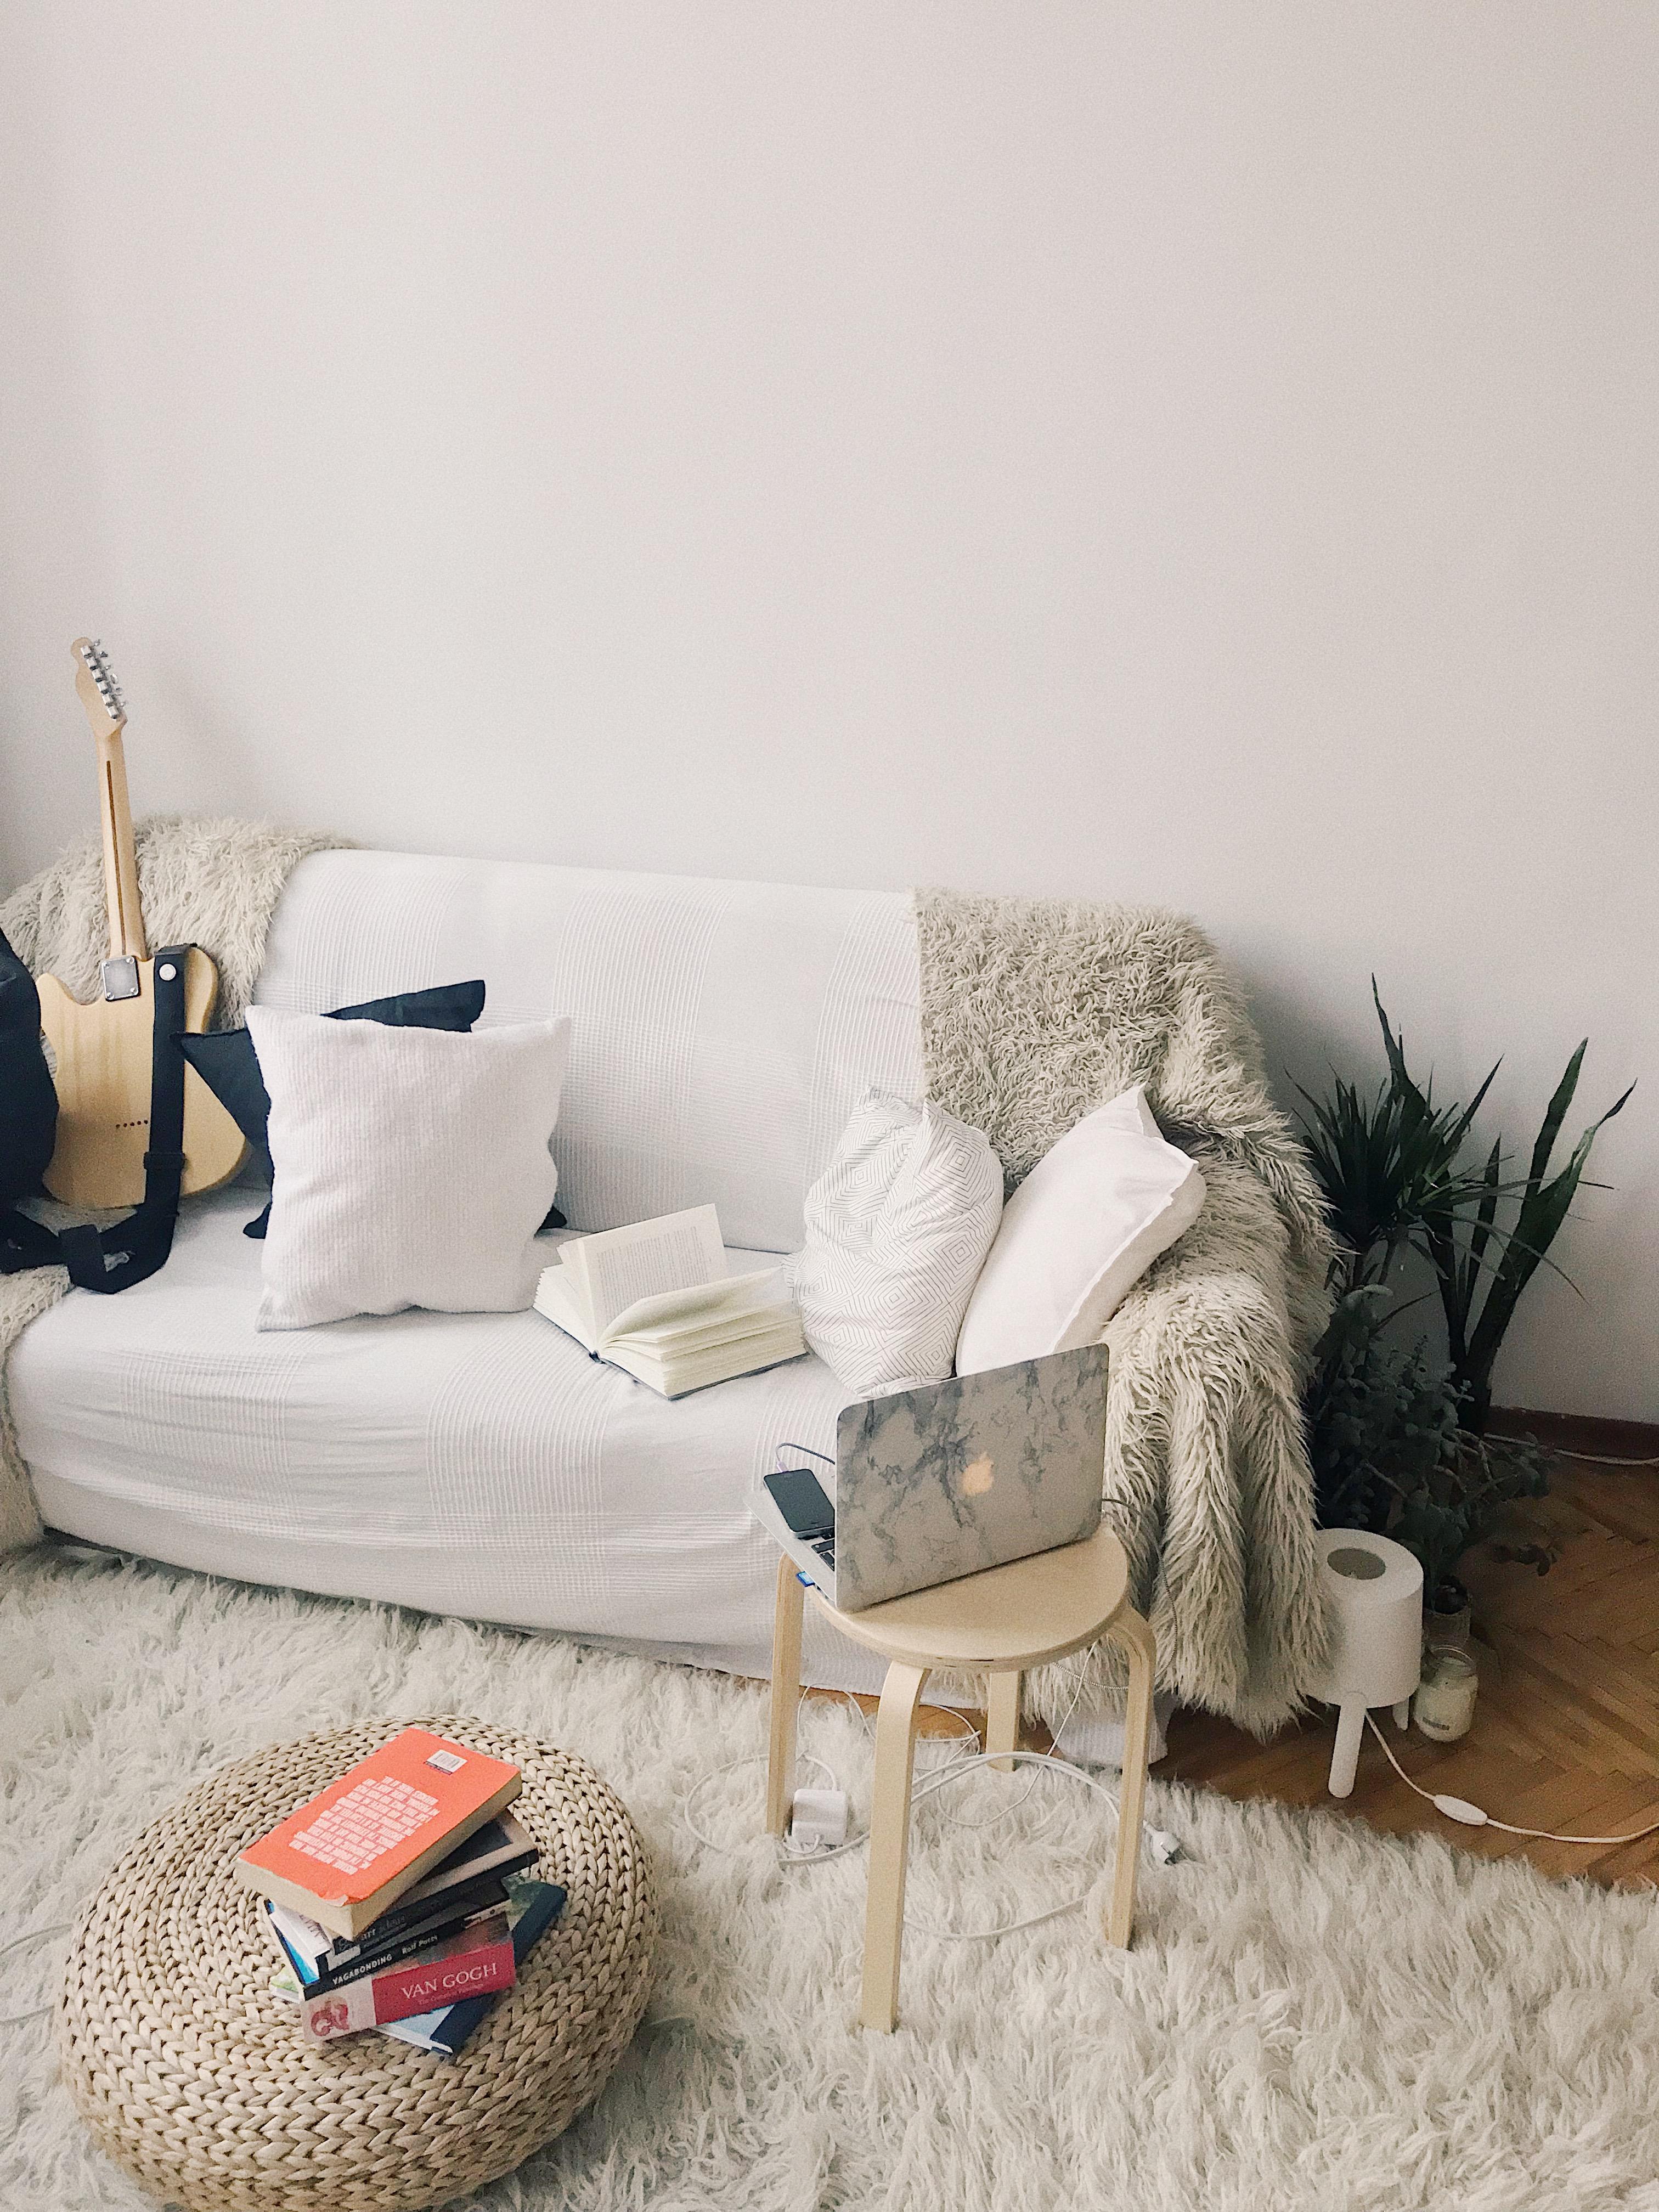 Rental DIY decoration ideas for beginners